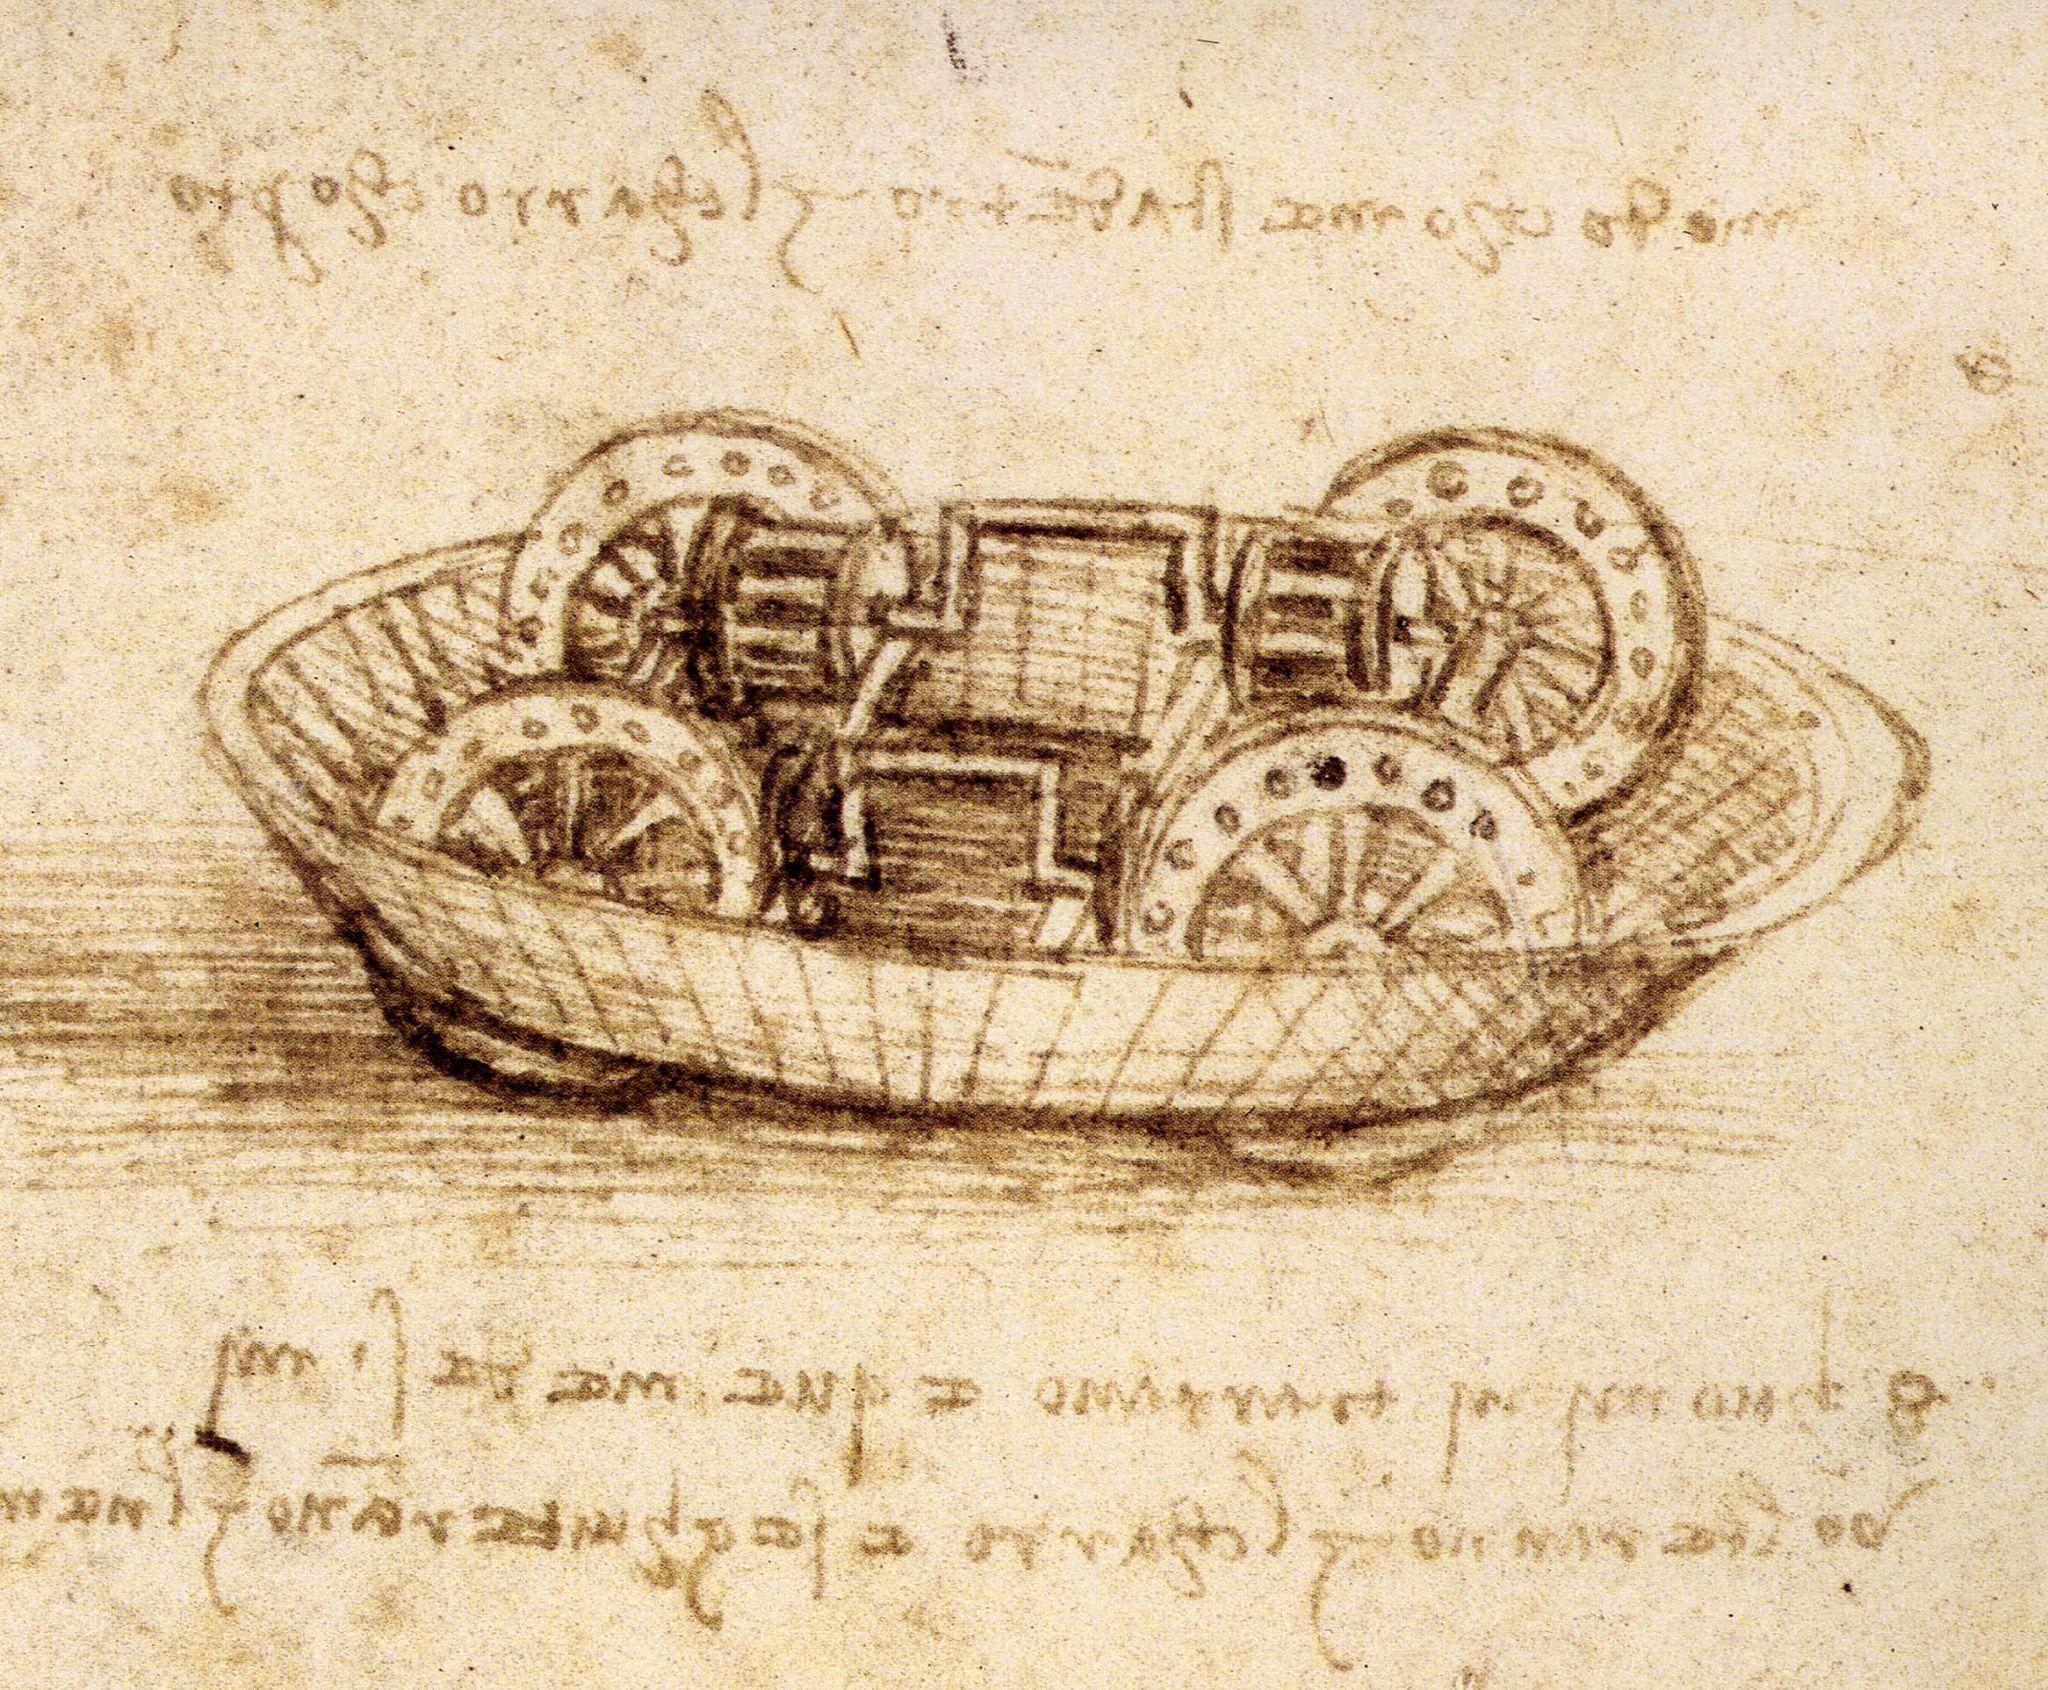 Even Leonardo Da Vinci Made Math Mistakes